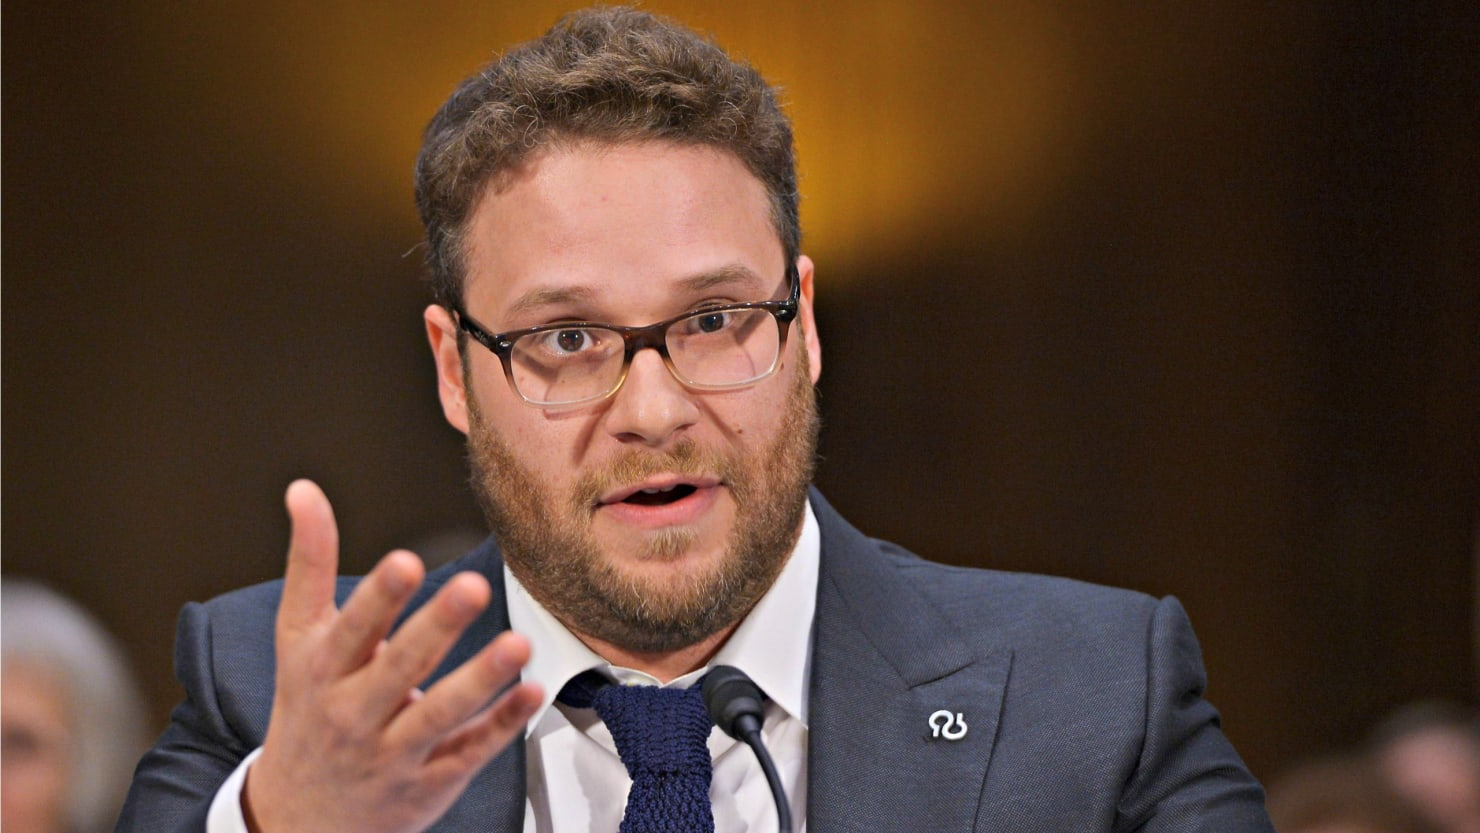 Seth Rogen Boycotts SiriusXM Over Steve Bannon Hire